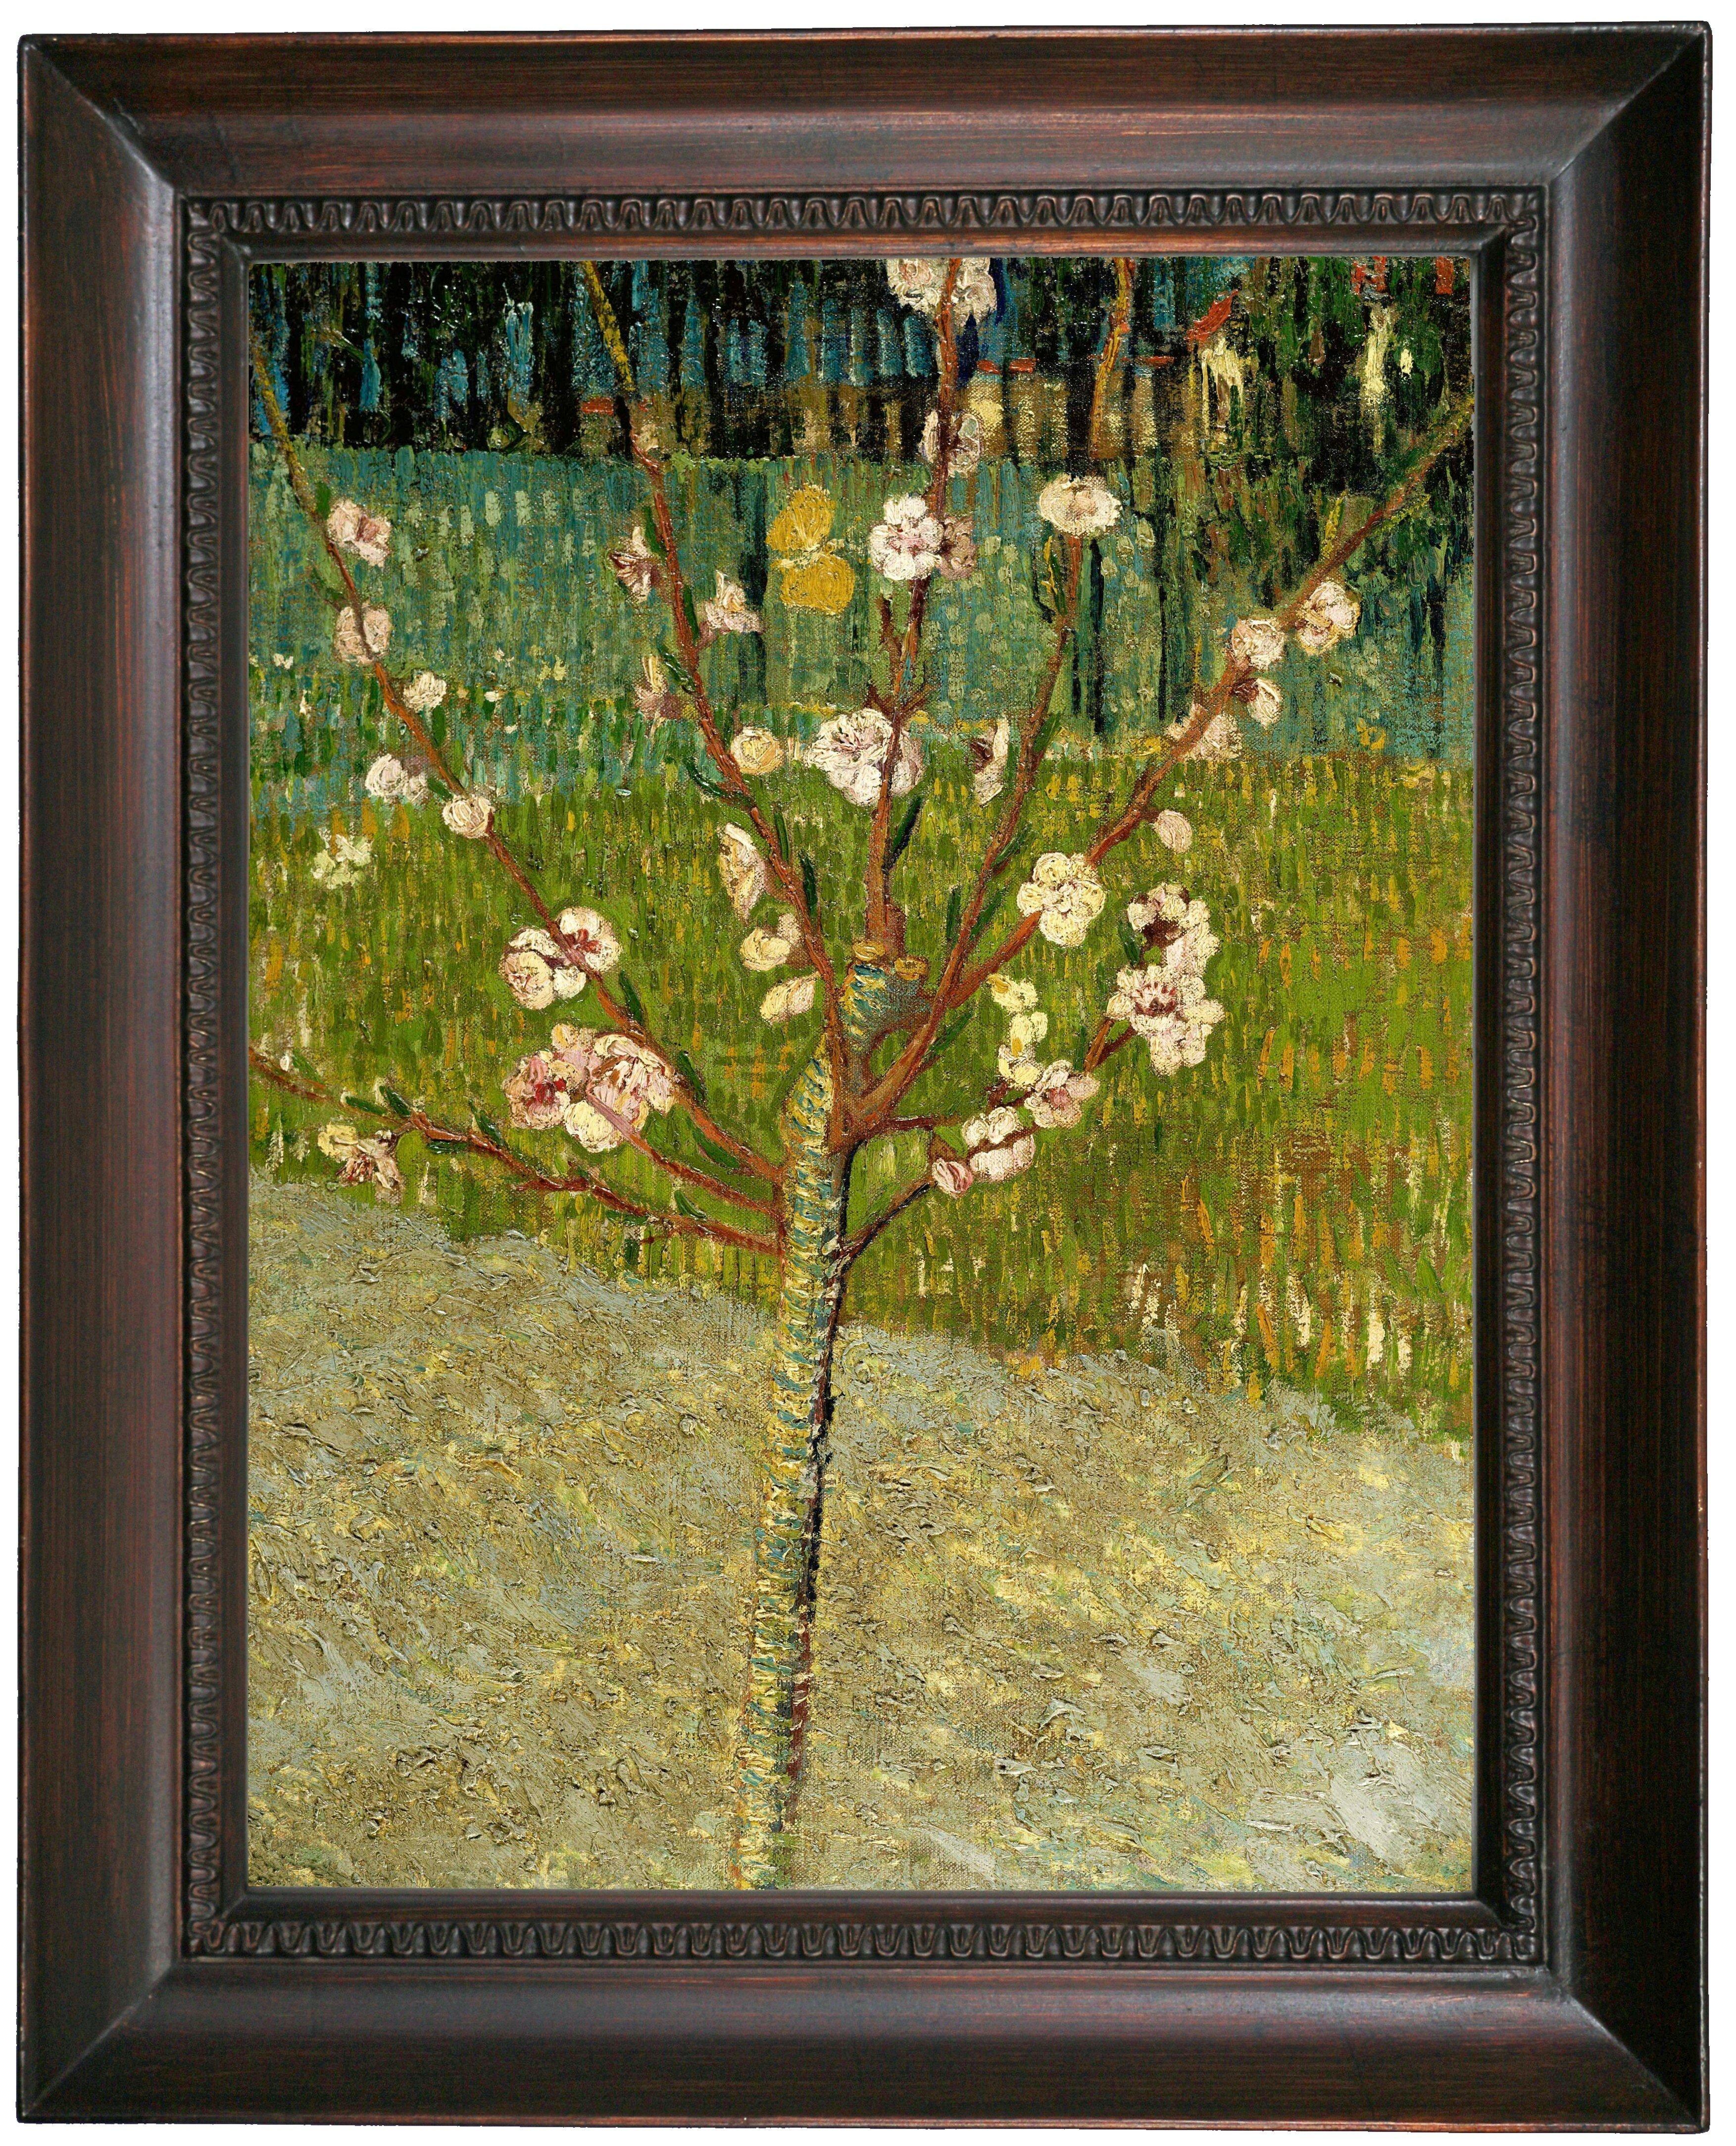 van Gogh Lane with Poplars Wood Framed Canvas Print Repro 8x10